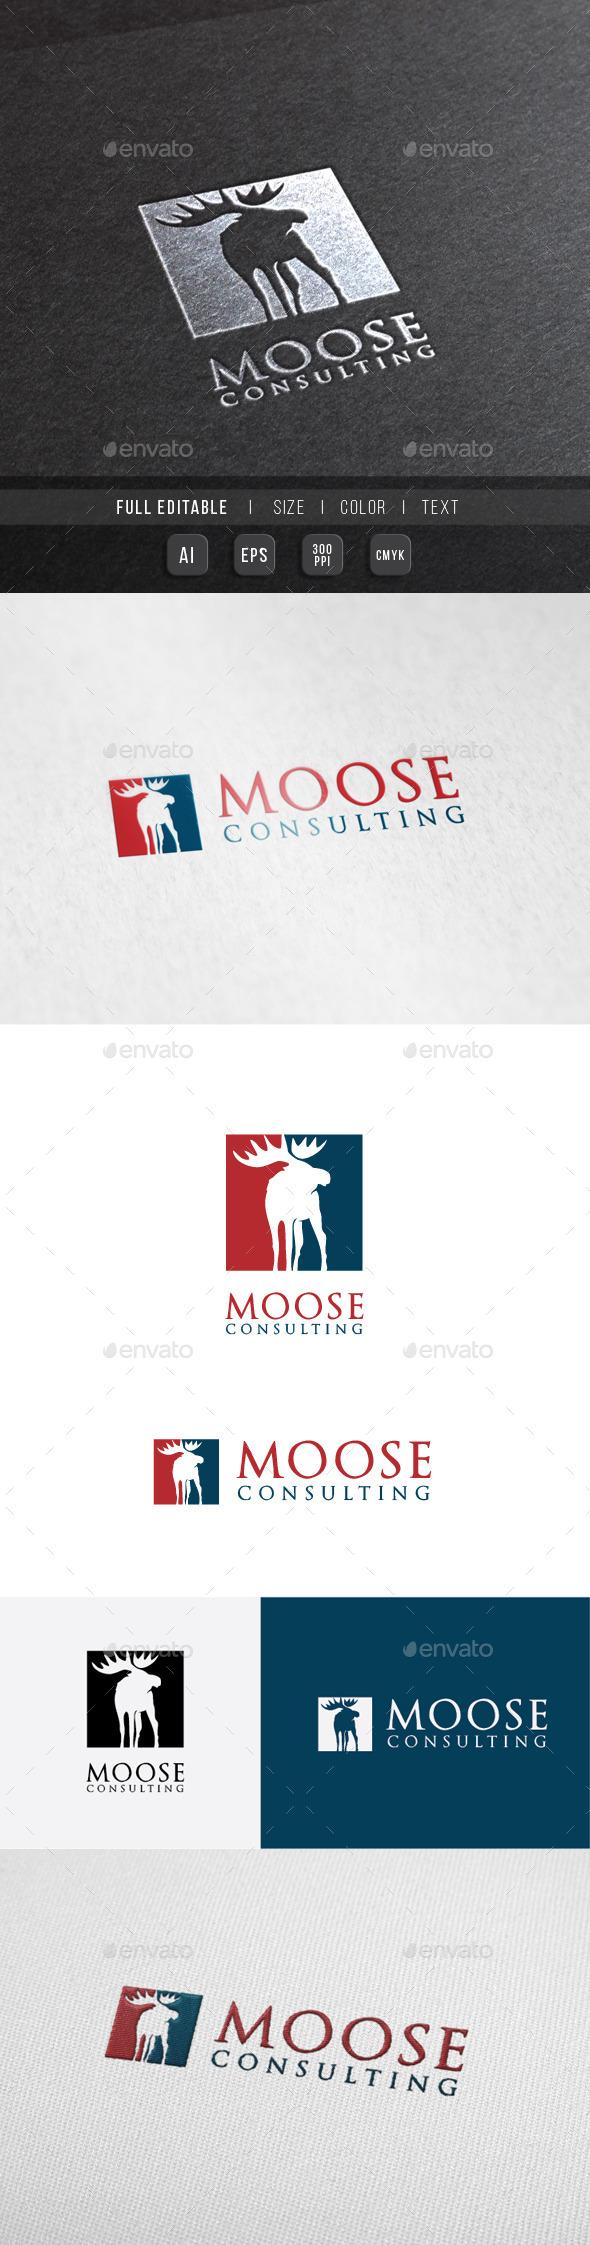 Moose Finance - Consulting Logo - Animals Logo Templates